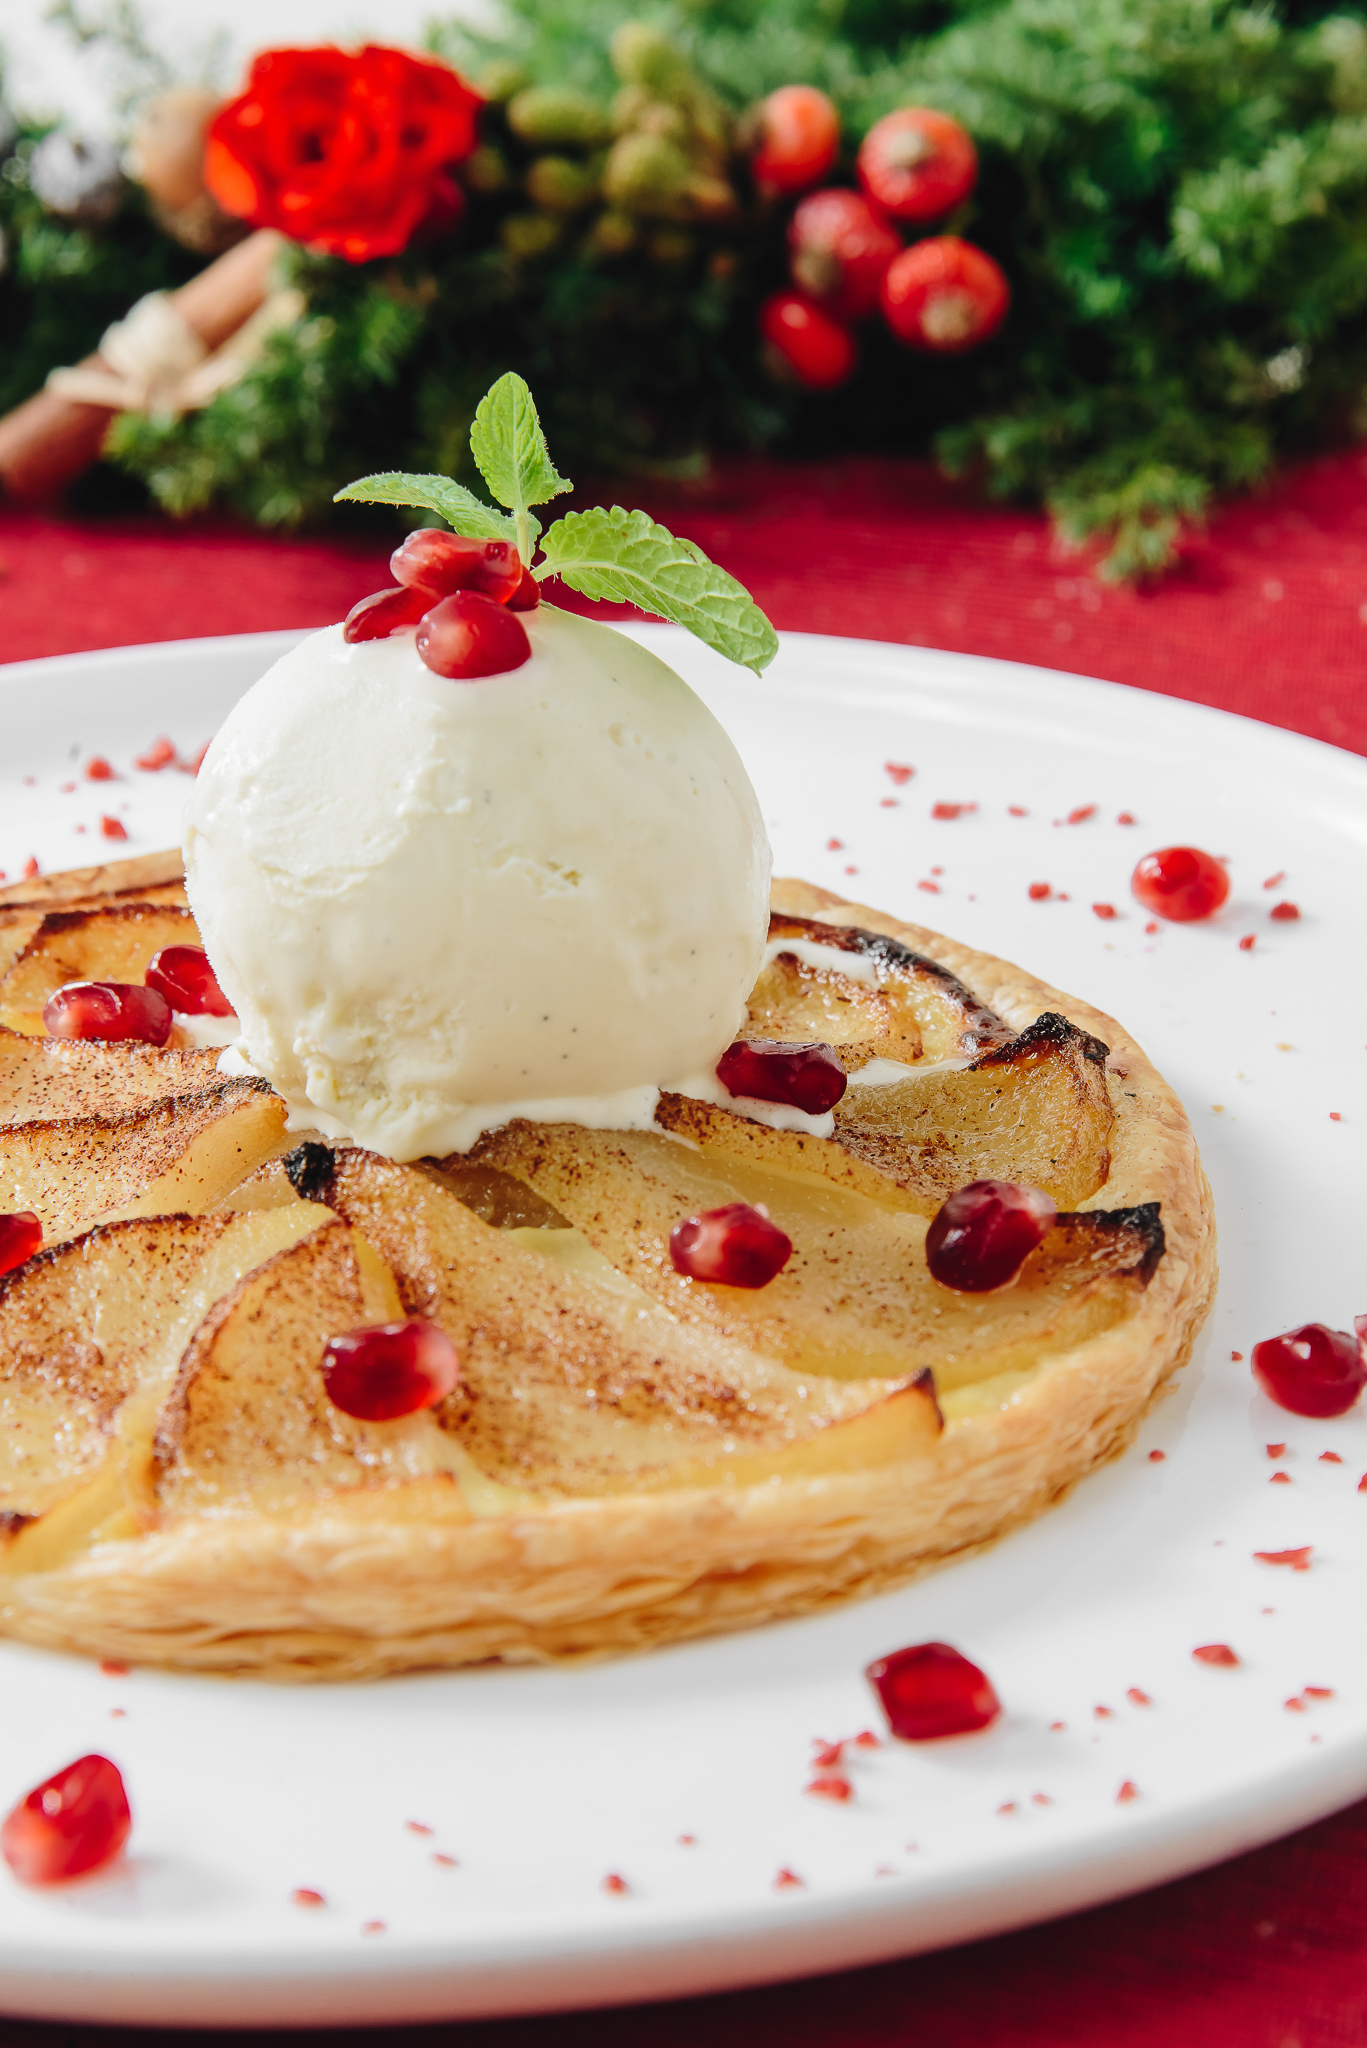 酥皮啤梨批 配雲呢拿雪糕  pear meringue pie with vanilla ice-cream